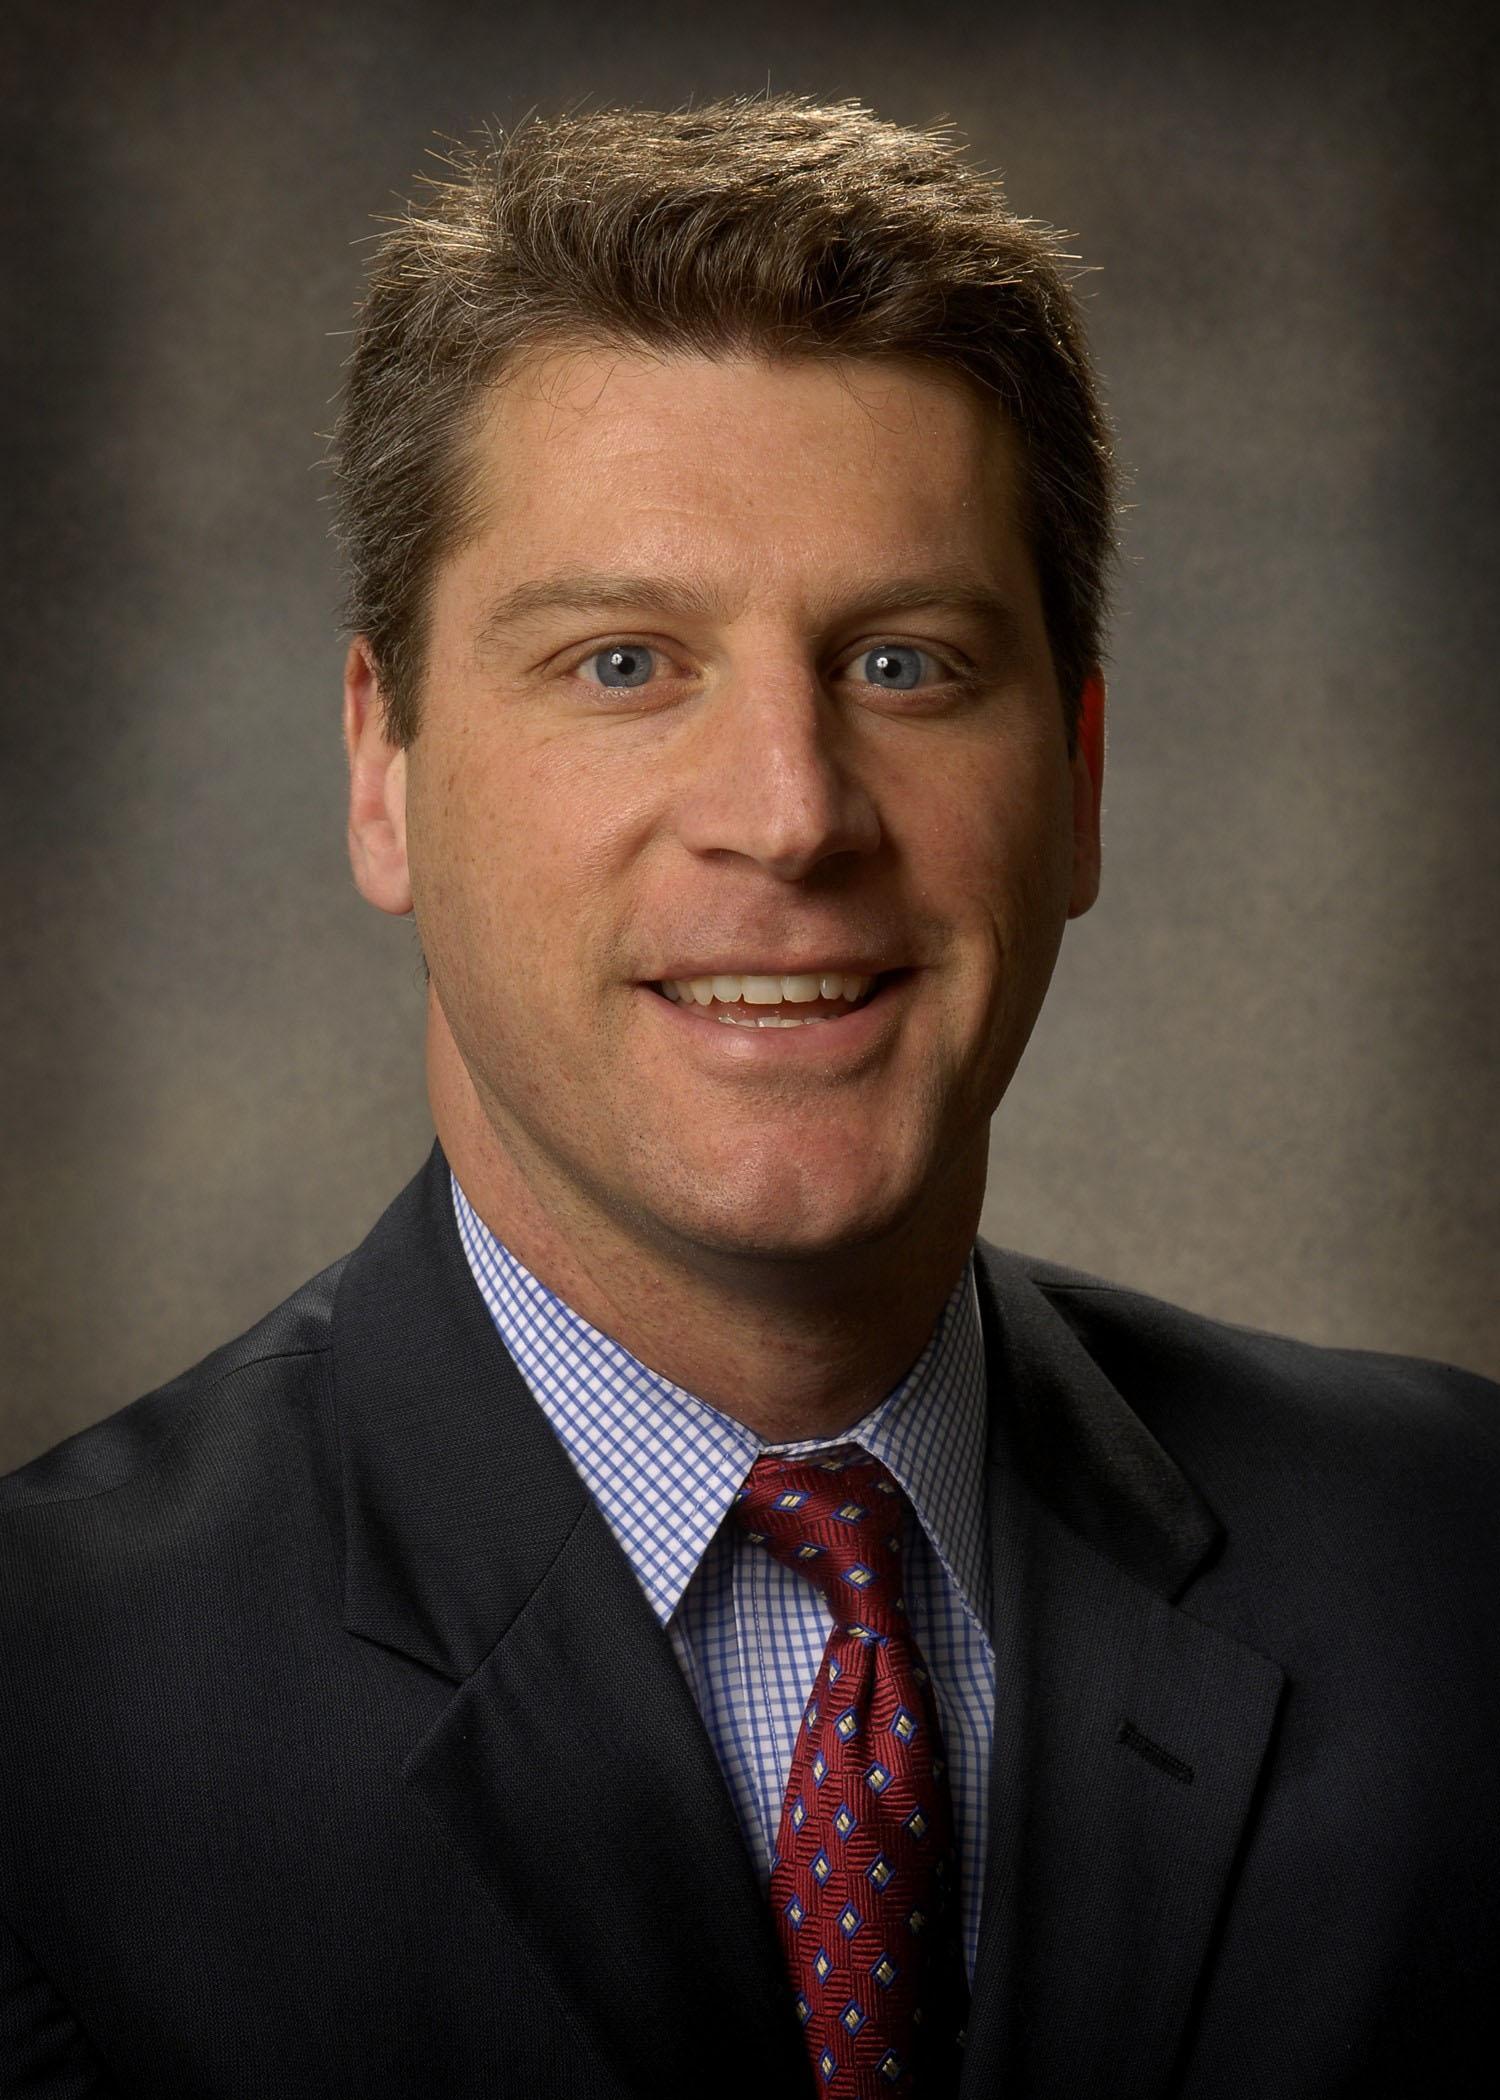 U.S. Attorney Heaphy to Keynote Public Service Conference ...